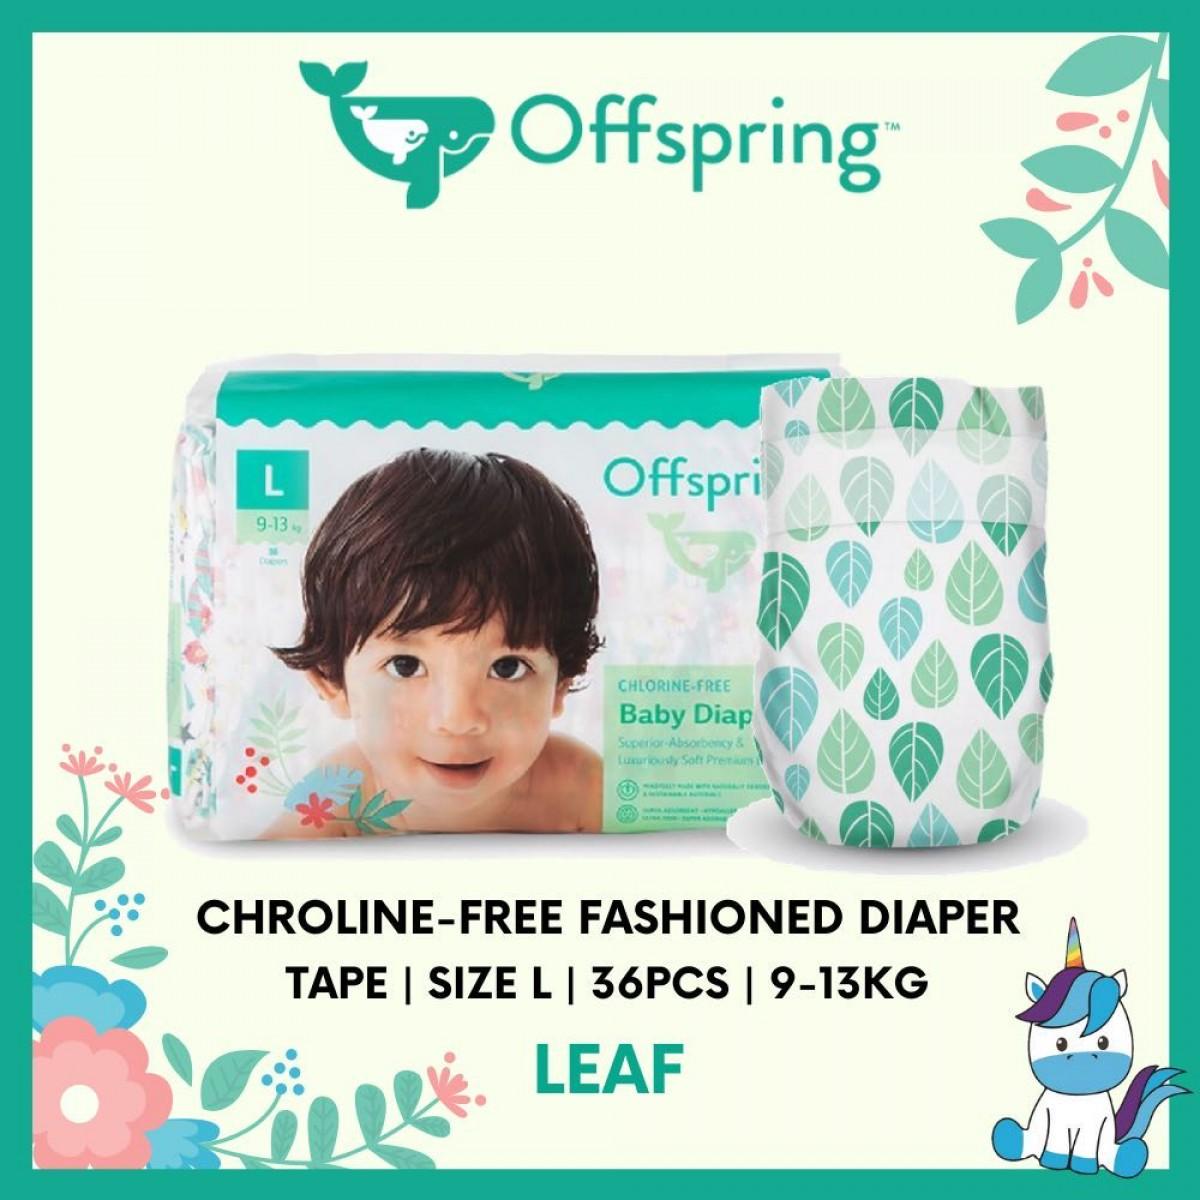 Offspring Chroline-Free Fashioned Tape Diaper L 36pcs - 9 Designs